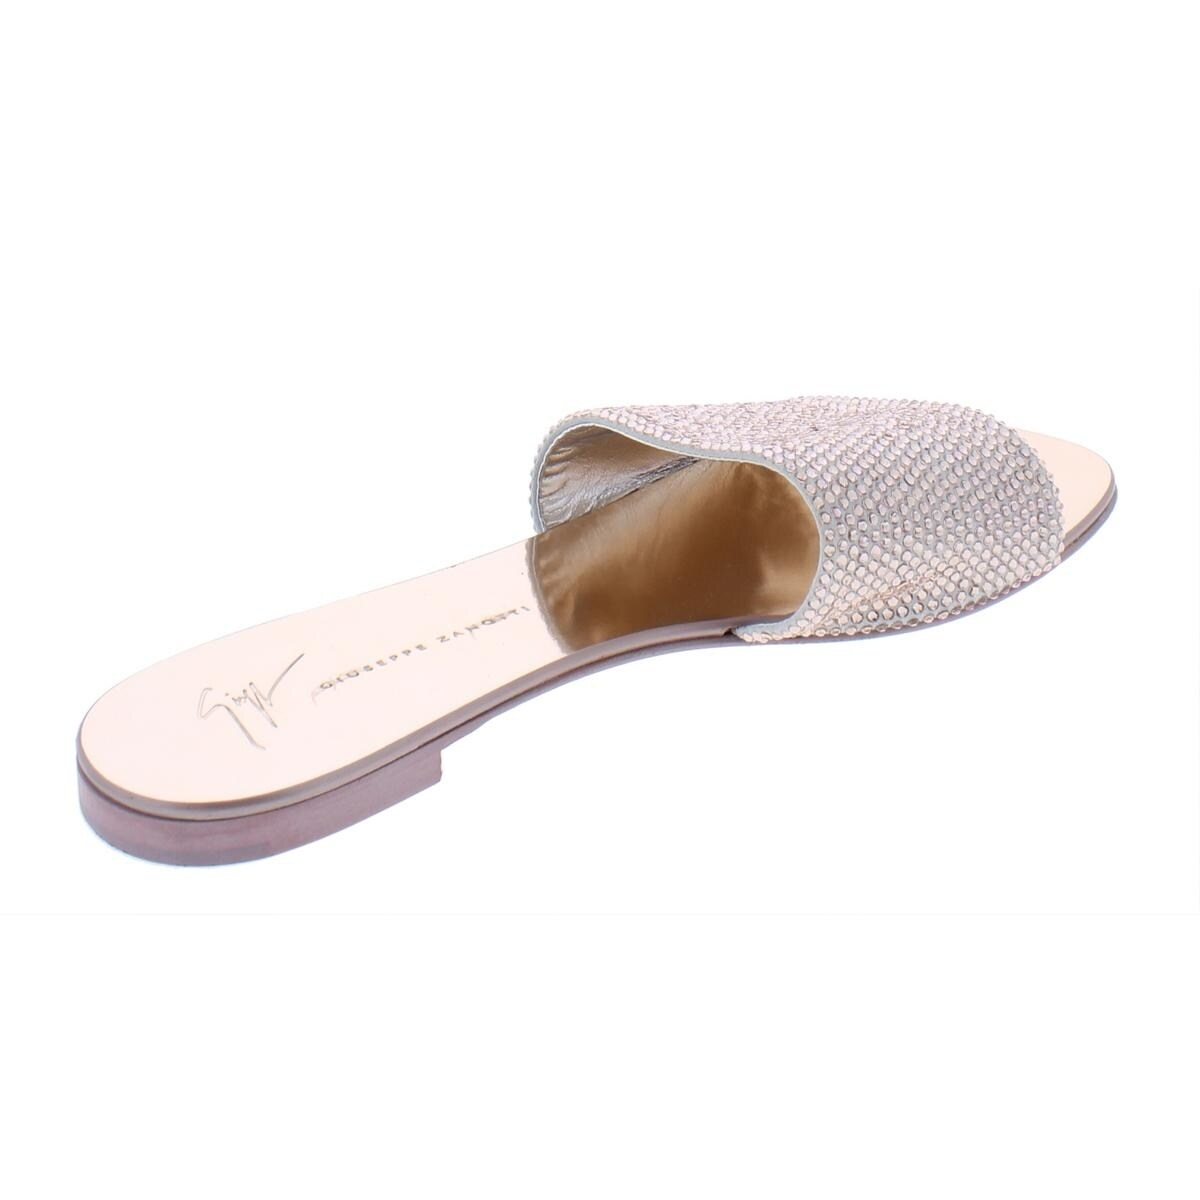 103f344a5 Shop Giuseppe Zanotti Womens Slide Sandals Leather Dressy - 39 Medium (B,M)  - Free Shipping Today - Overstock - 26419158